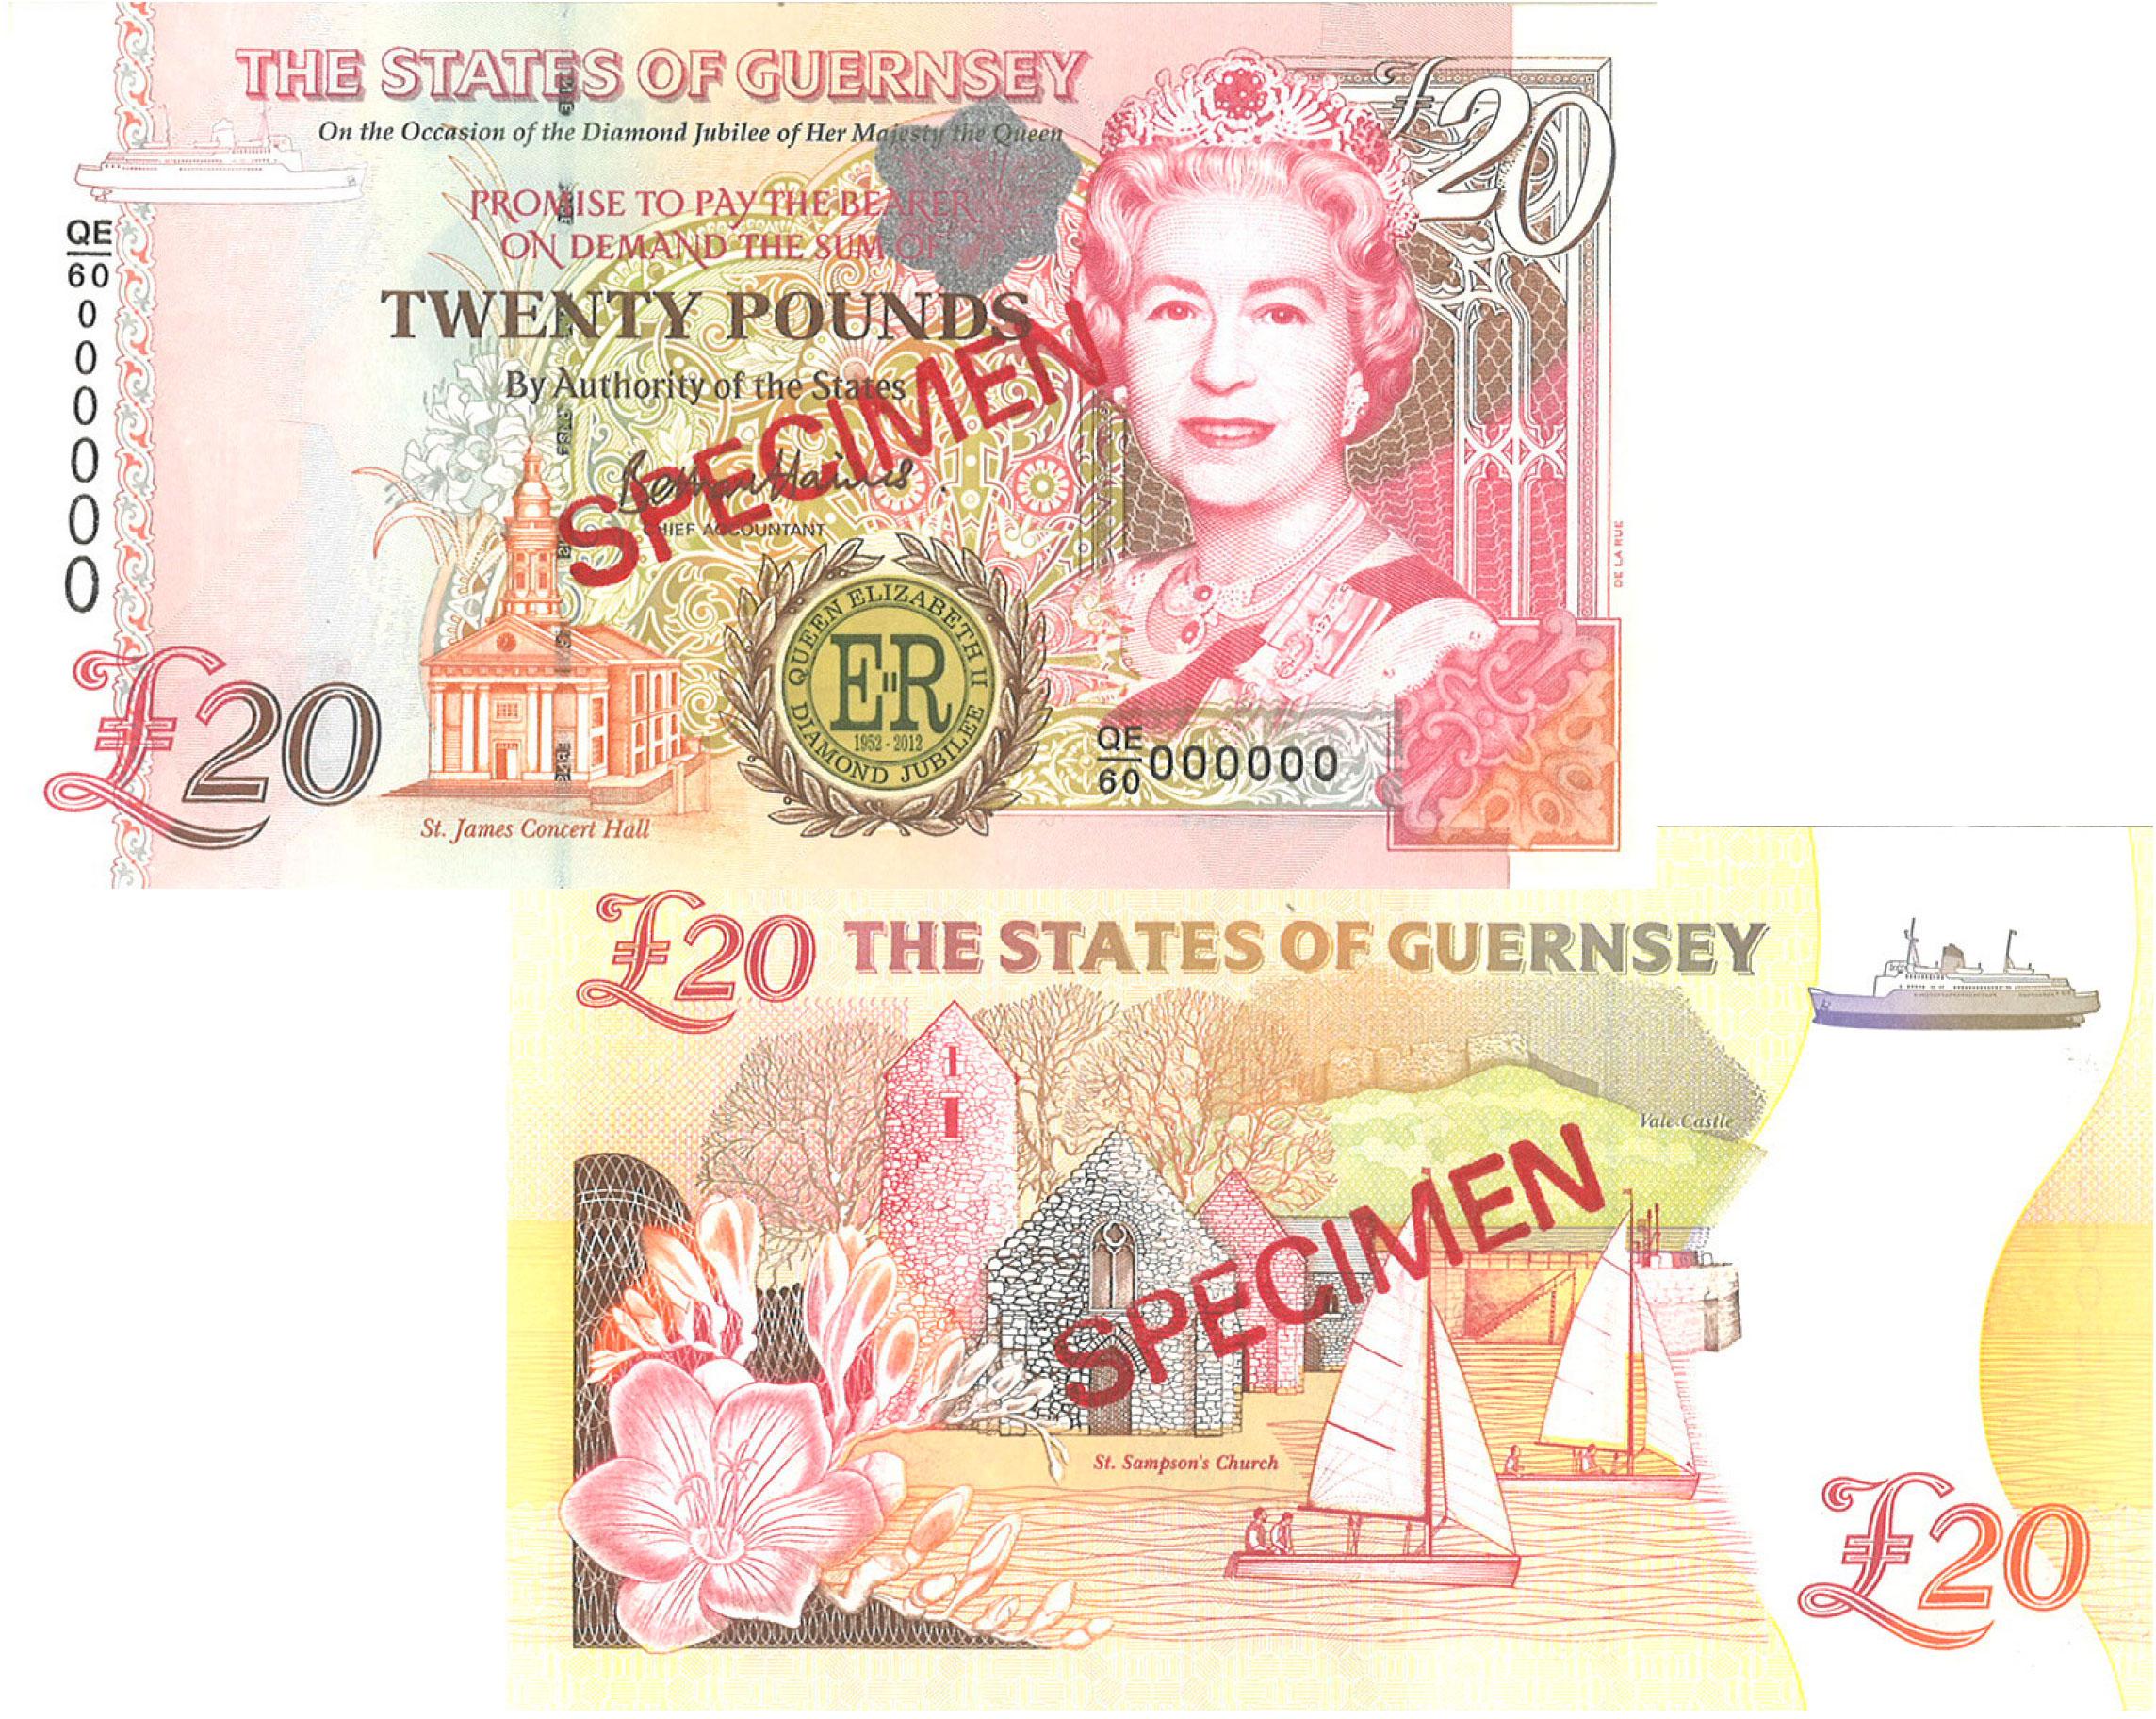 £20 Diamond Jubilee Guernsey Bank Note - B. Haines signatory